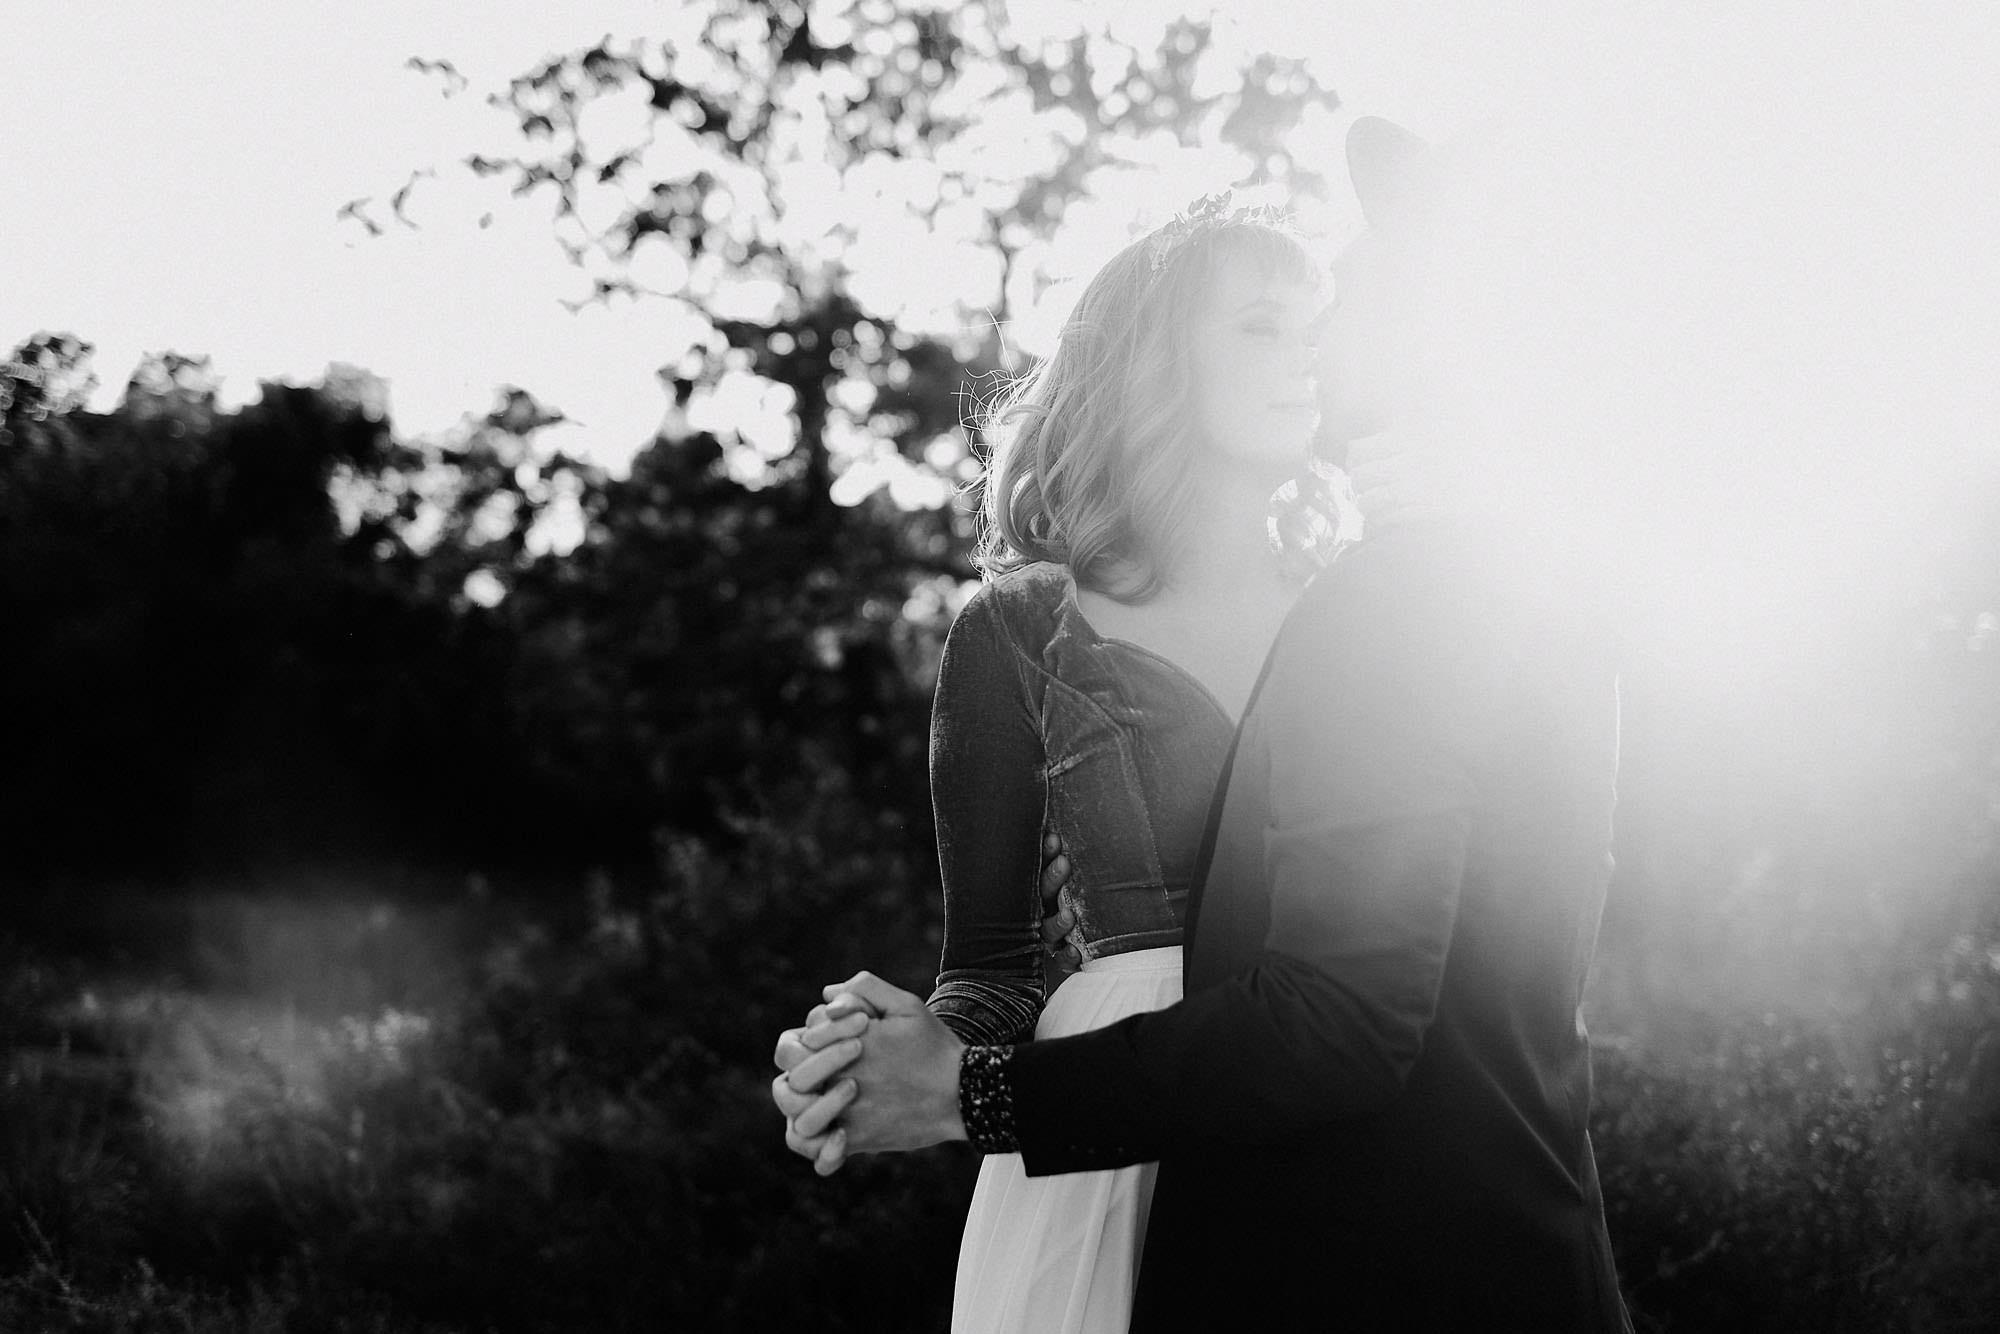 goult provence france elopement vow renewal couple dancing photo